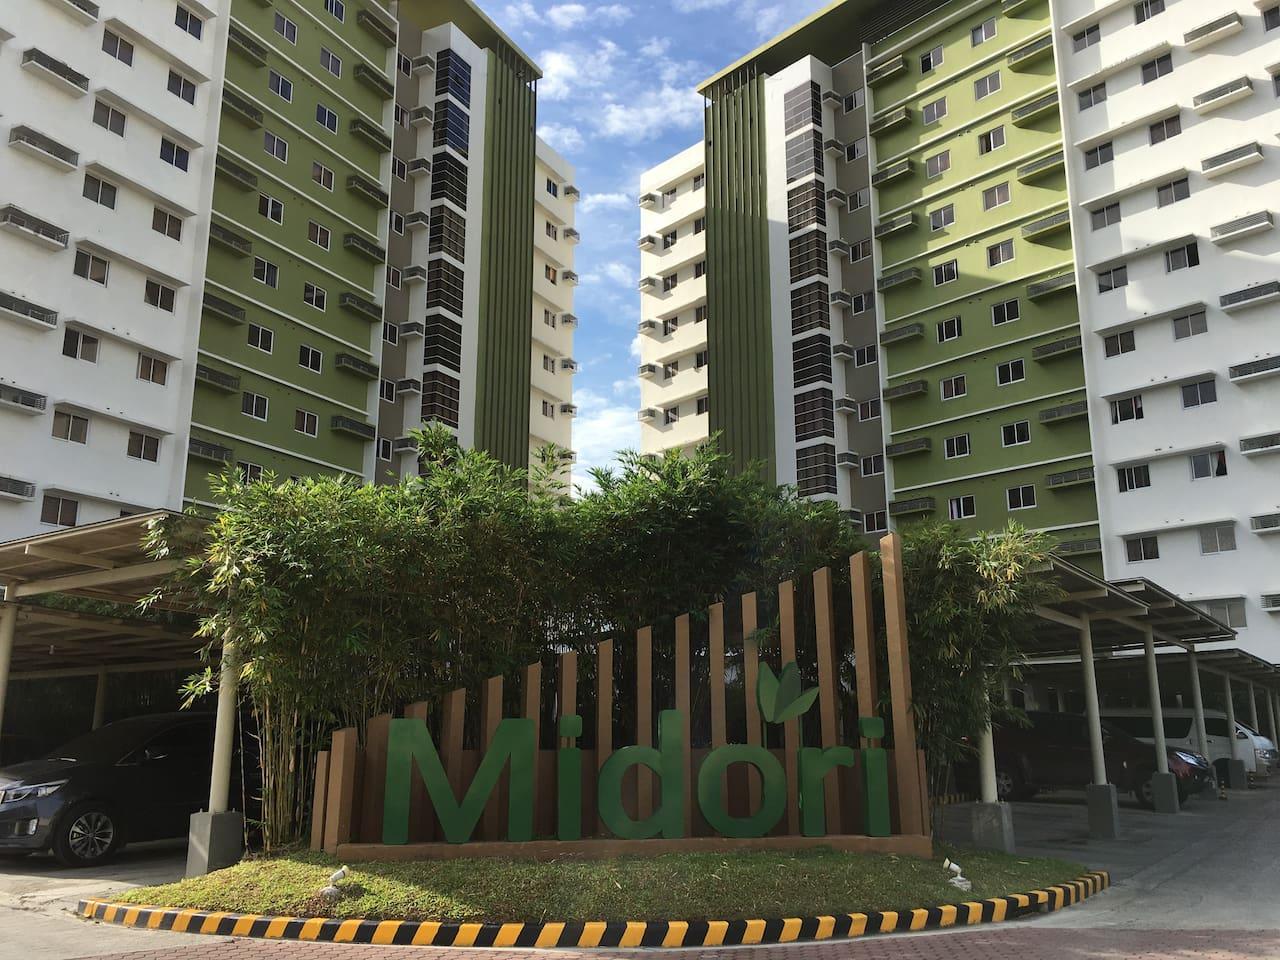 Welcome to Midori Residences!